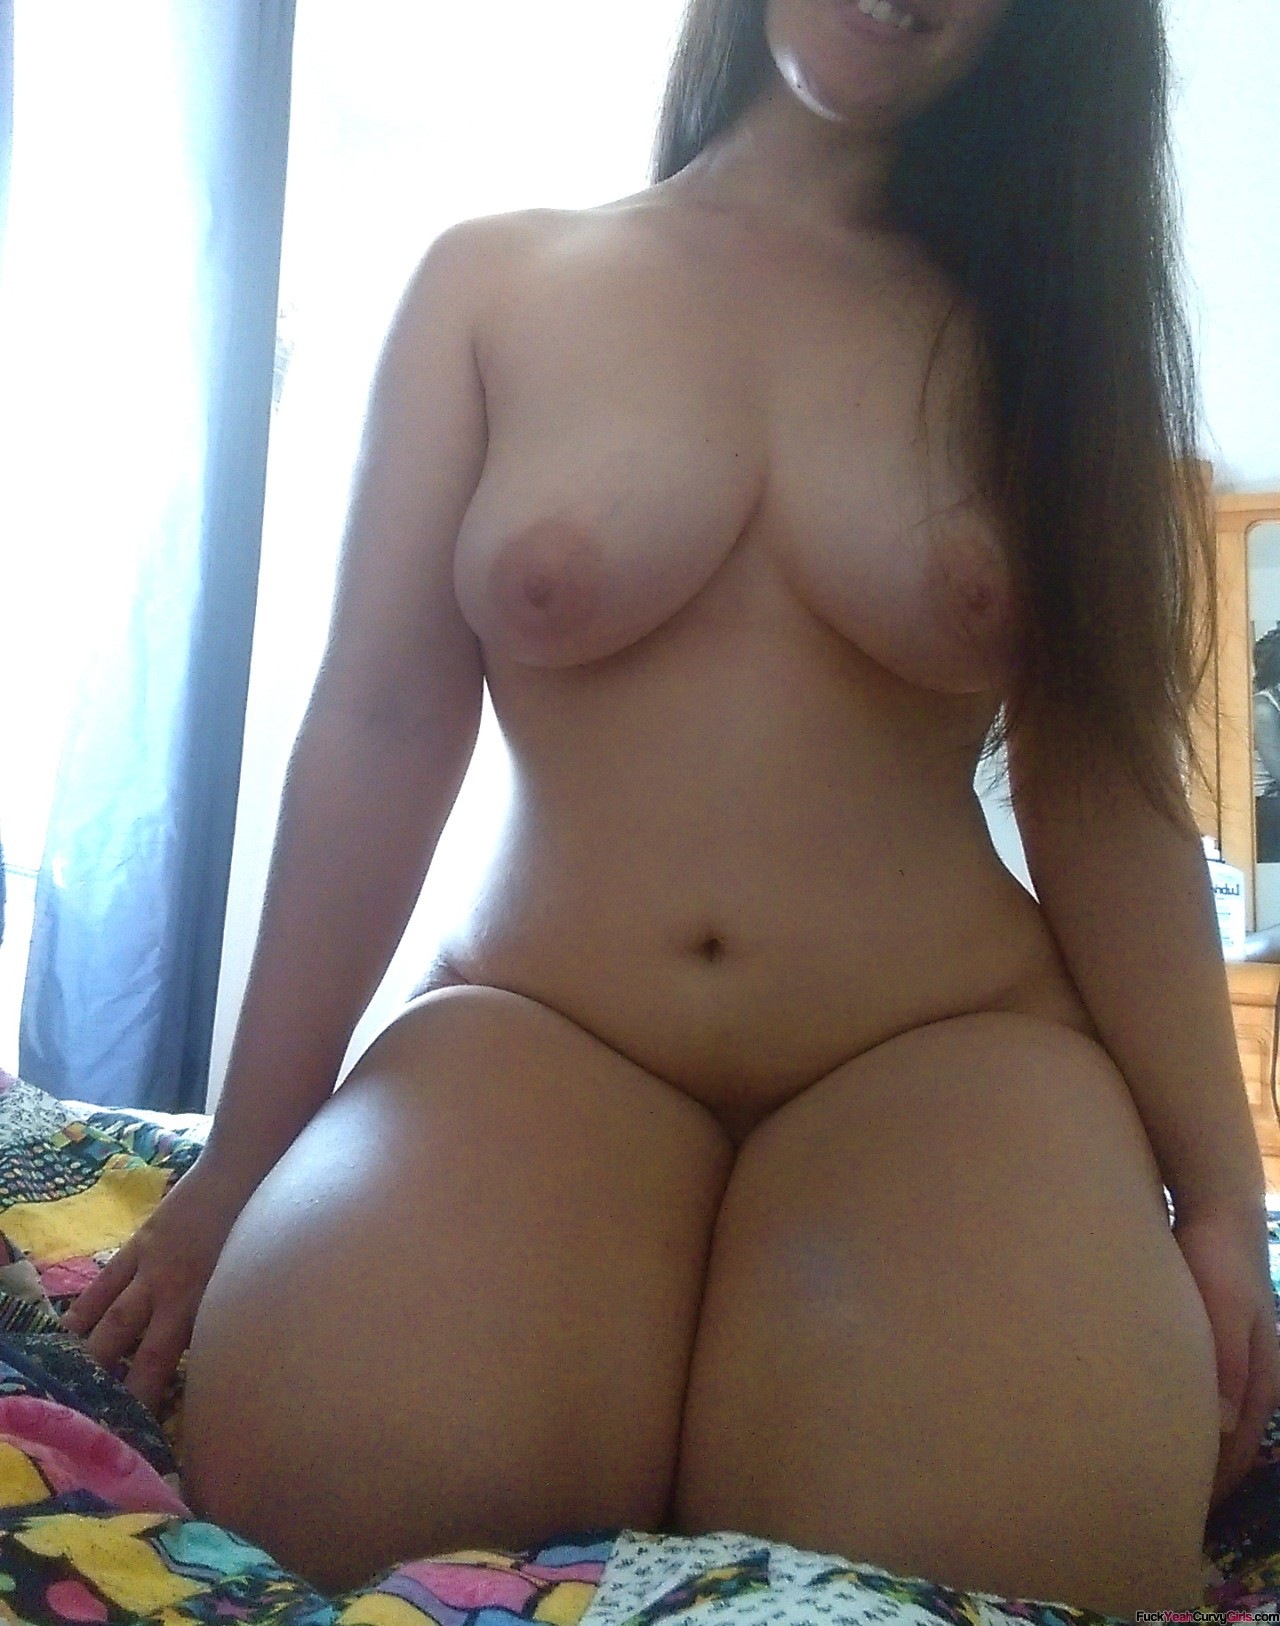 big curvy amateur girls nude